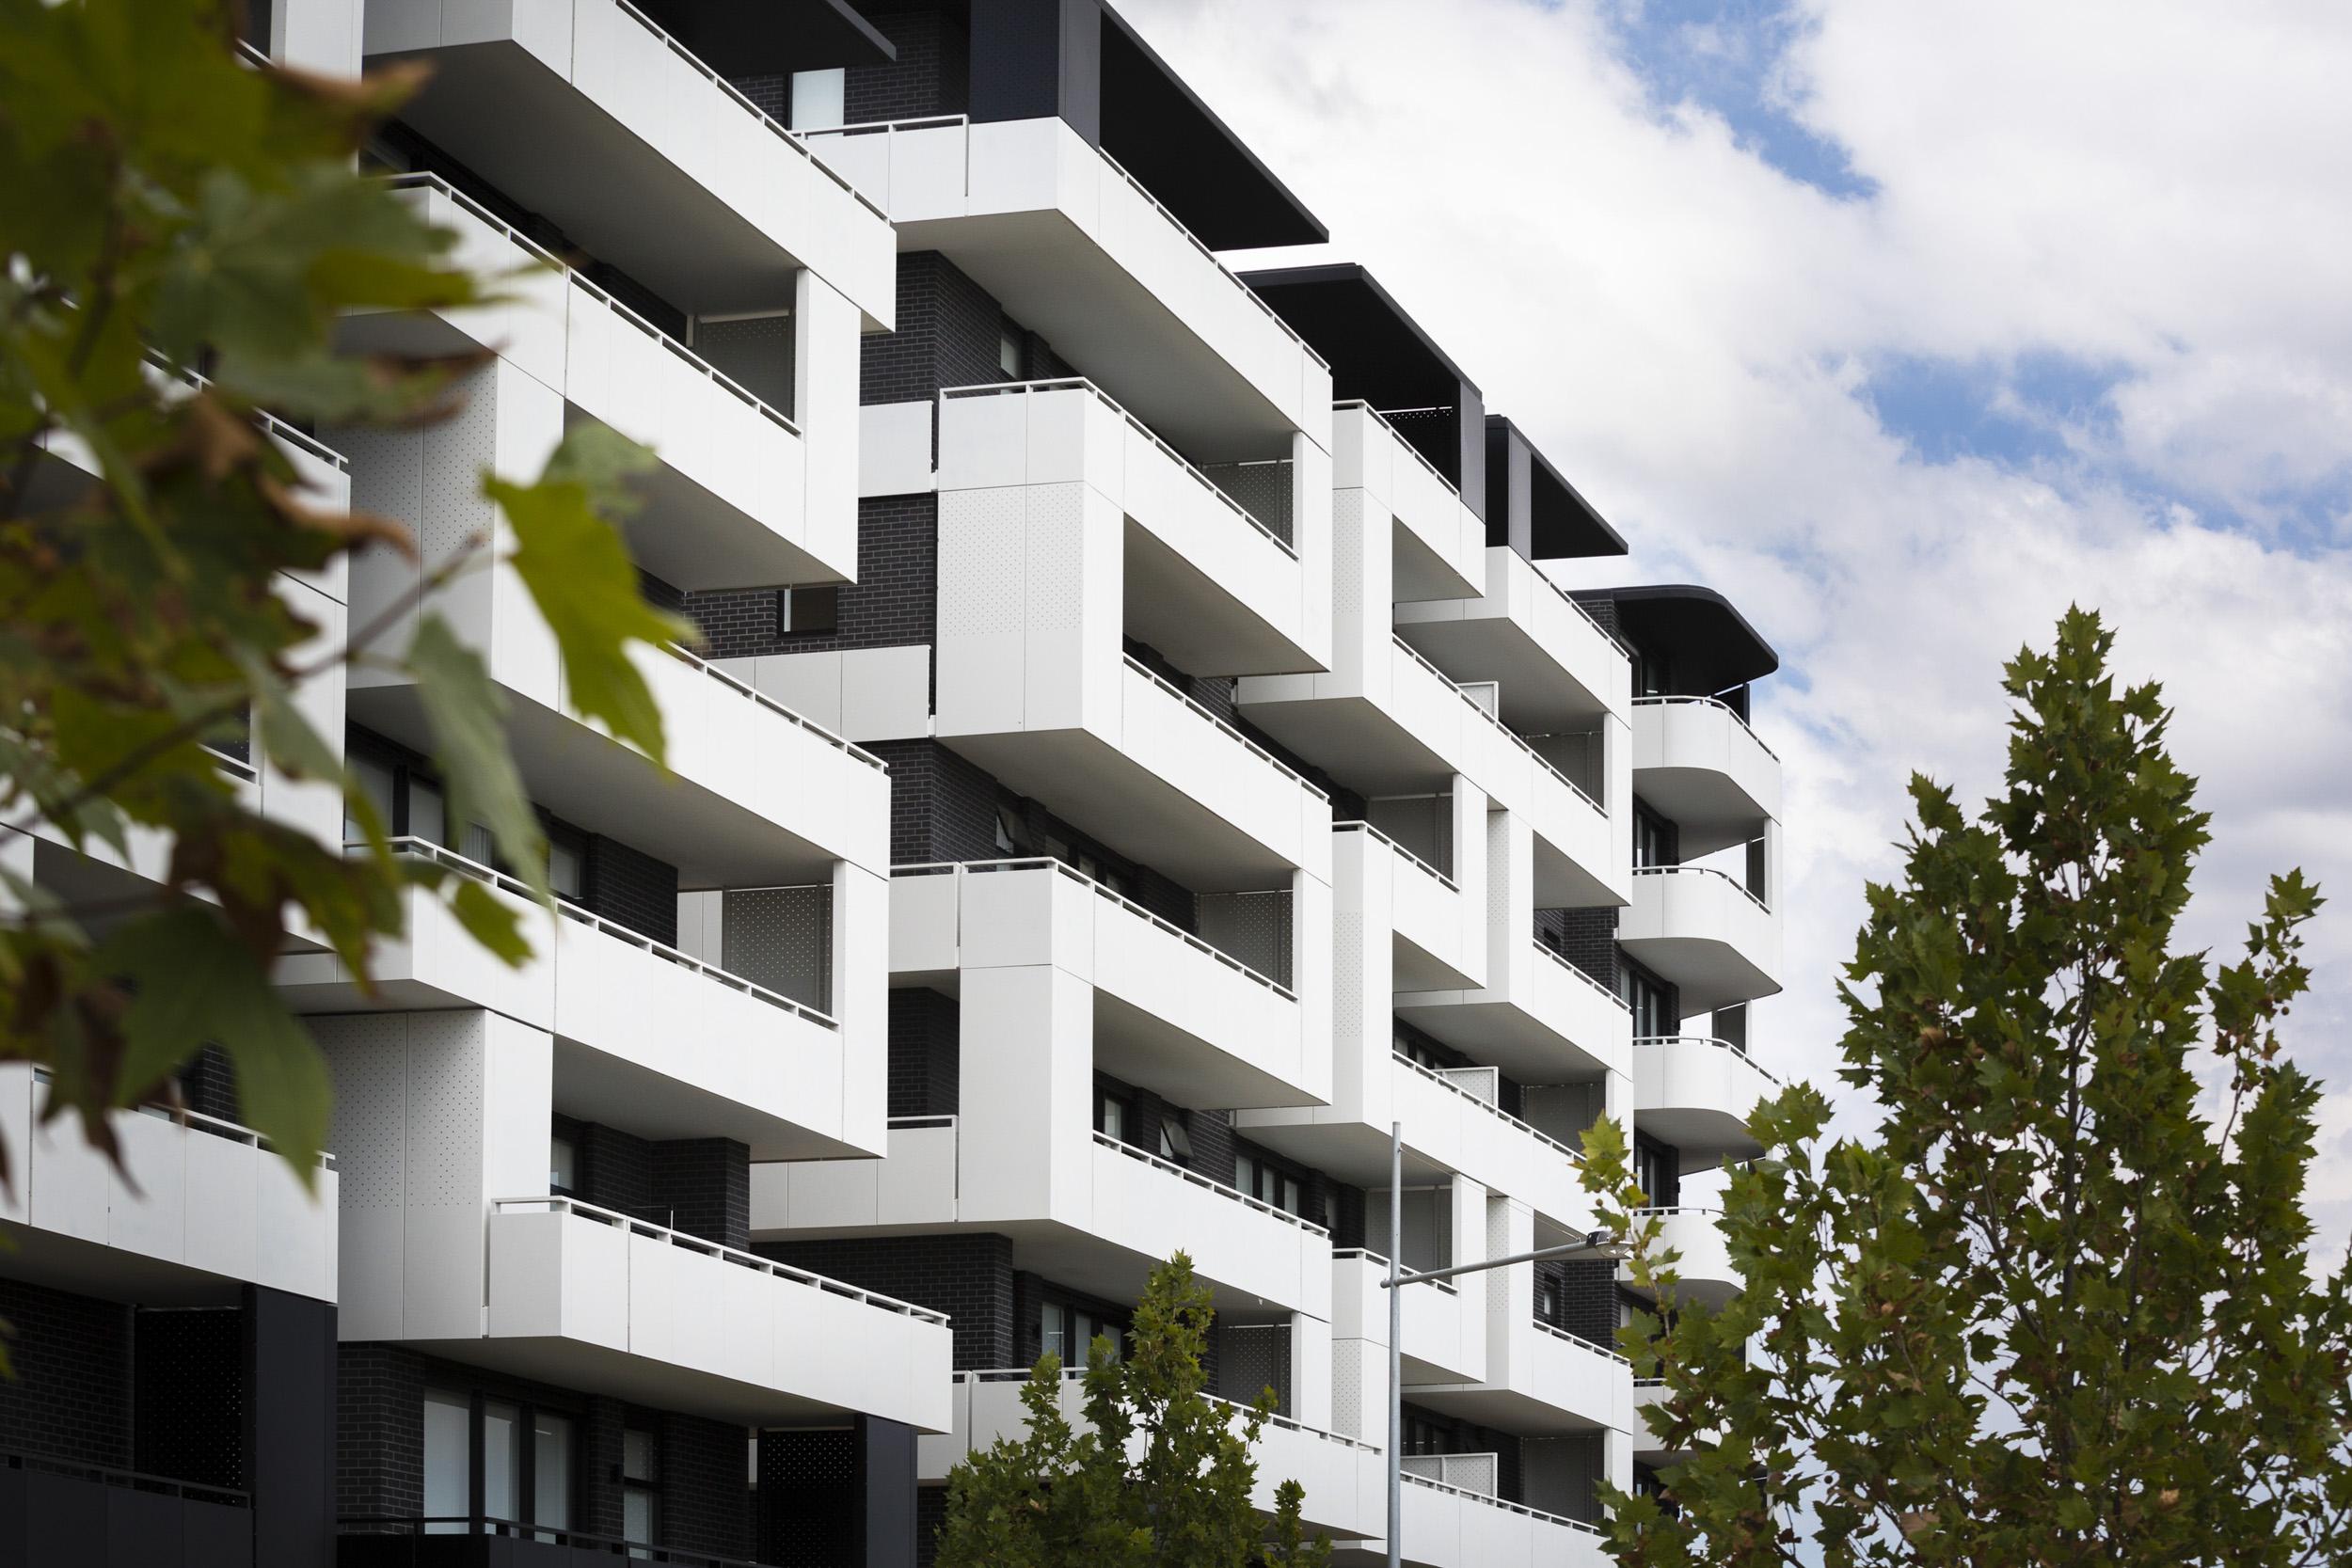 architecture_photography_sydney_australia_37.jpg